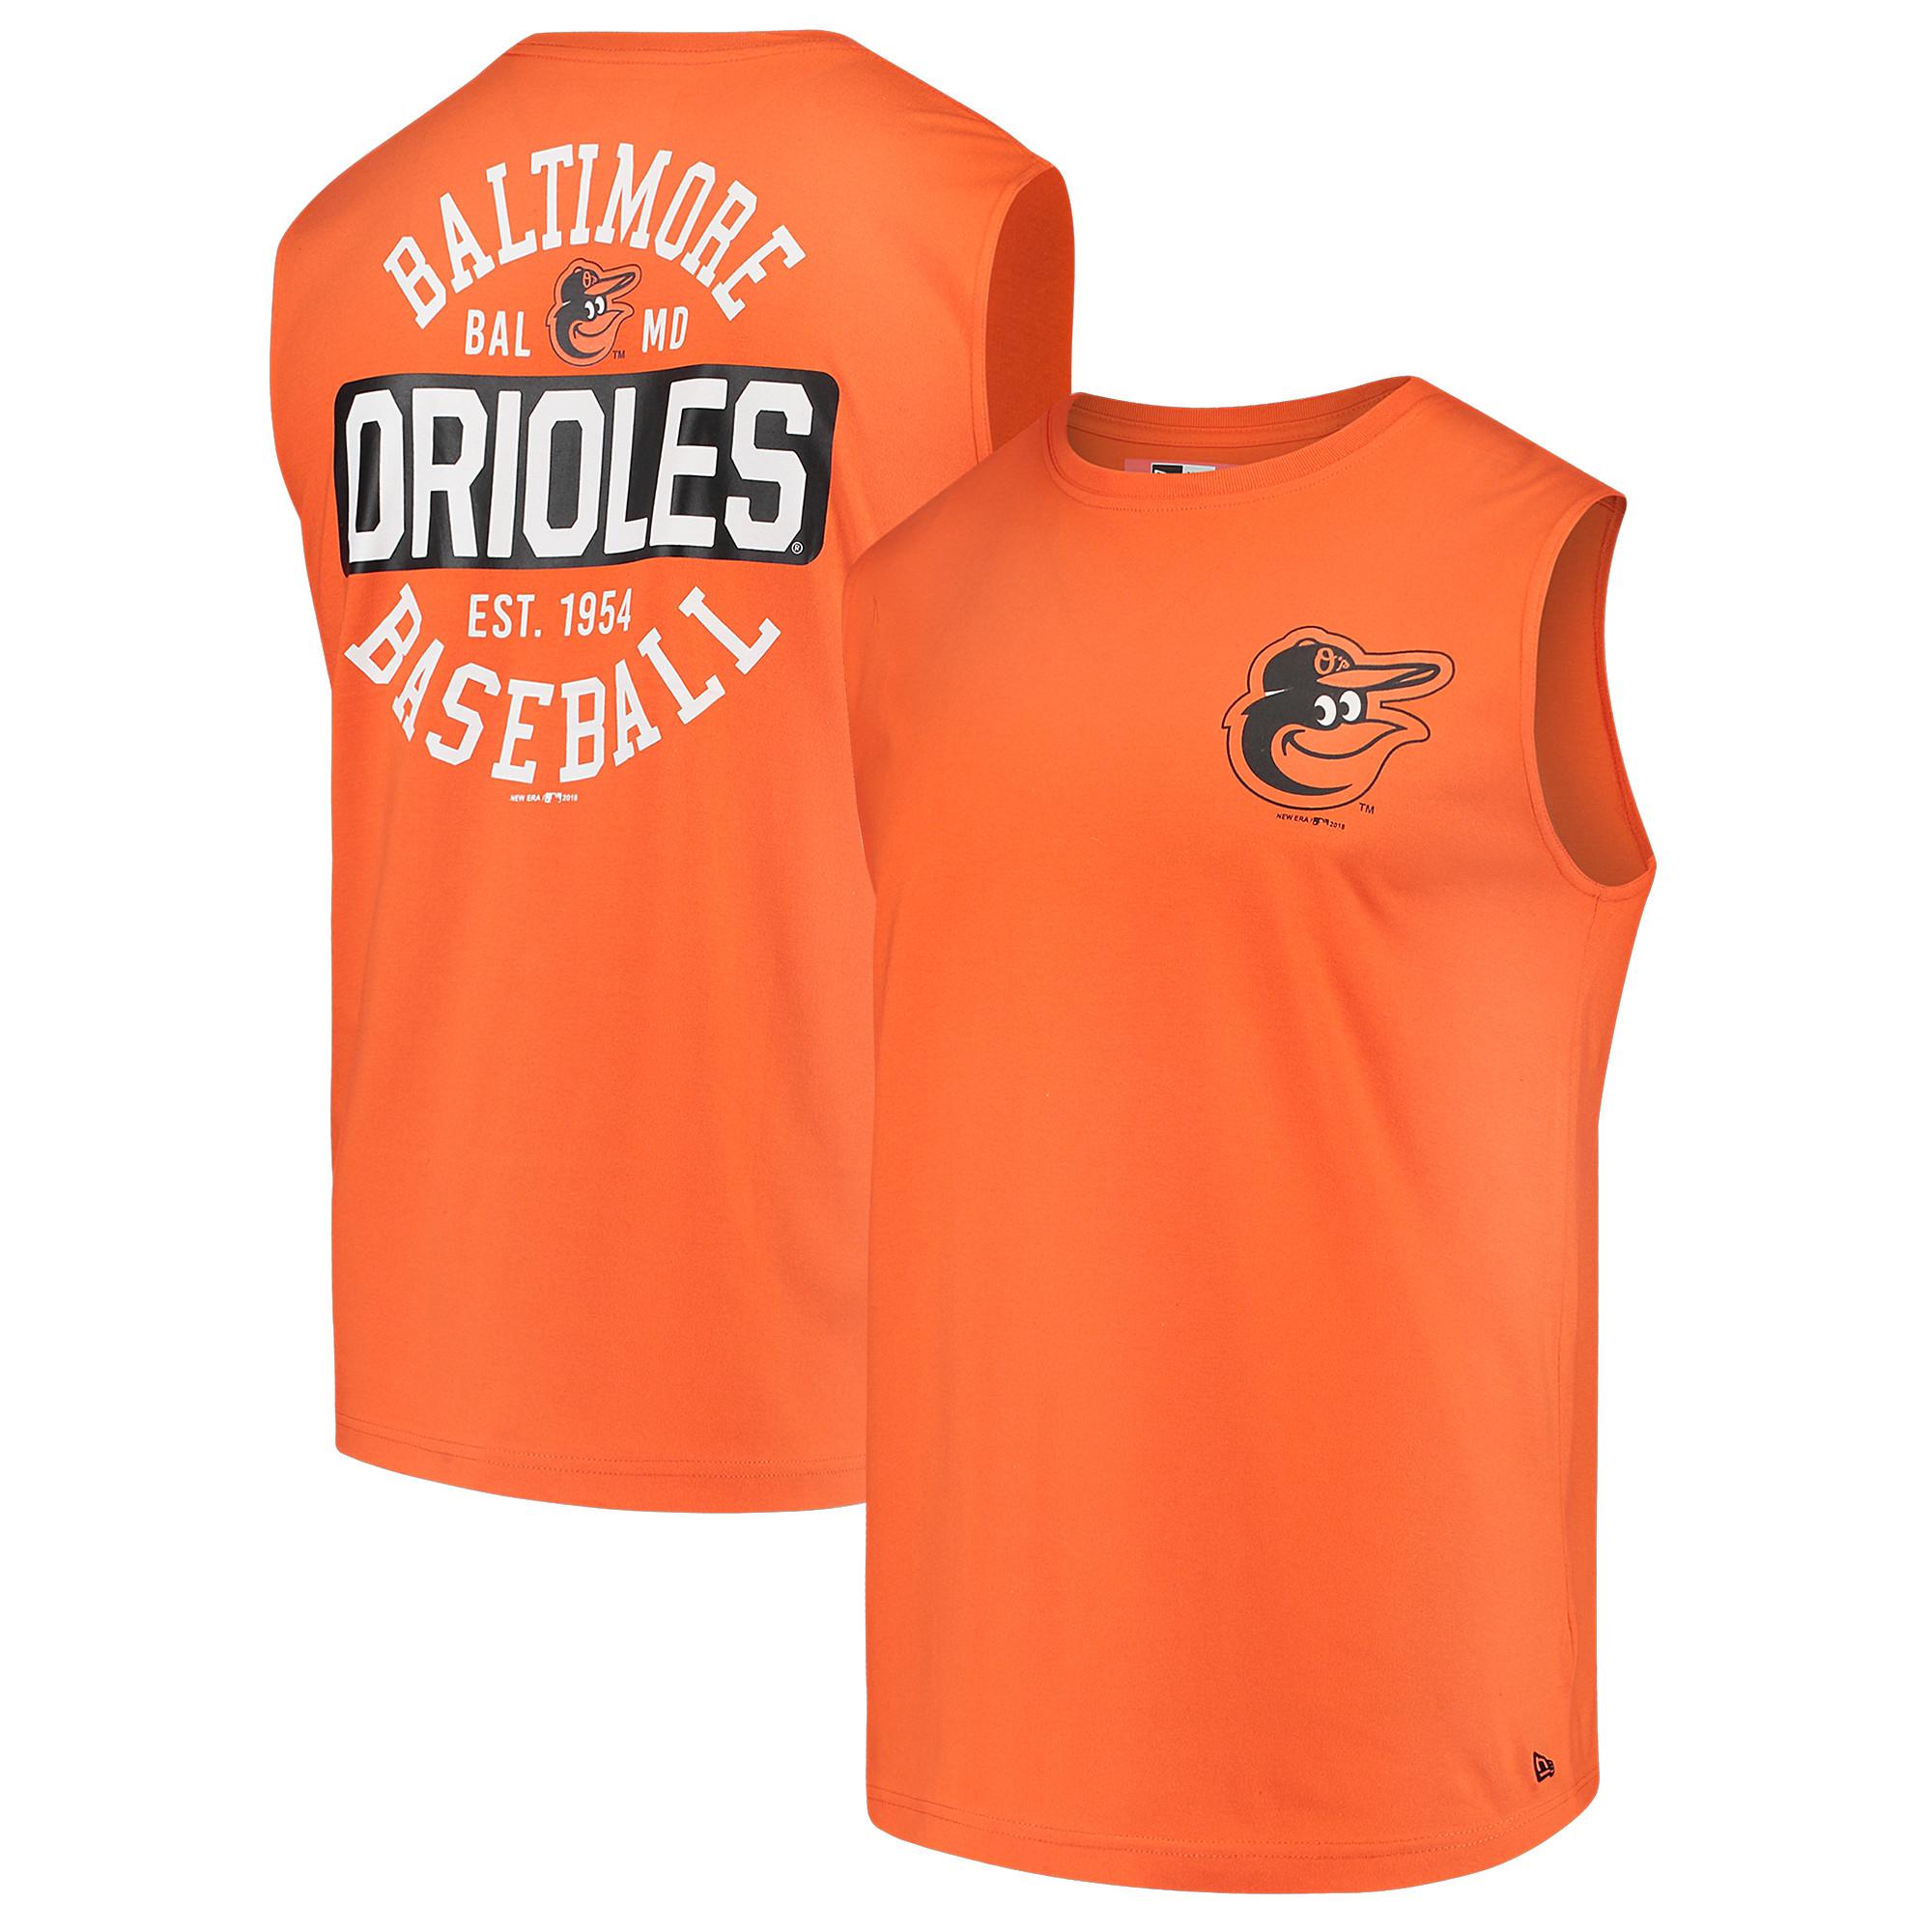 Baltimore Orioles New Era Jersey Muscle T-Shirt - Orange